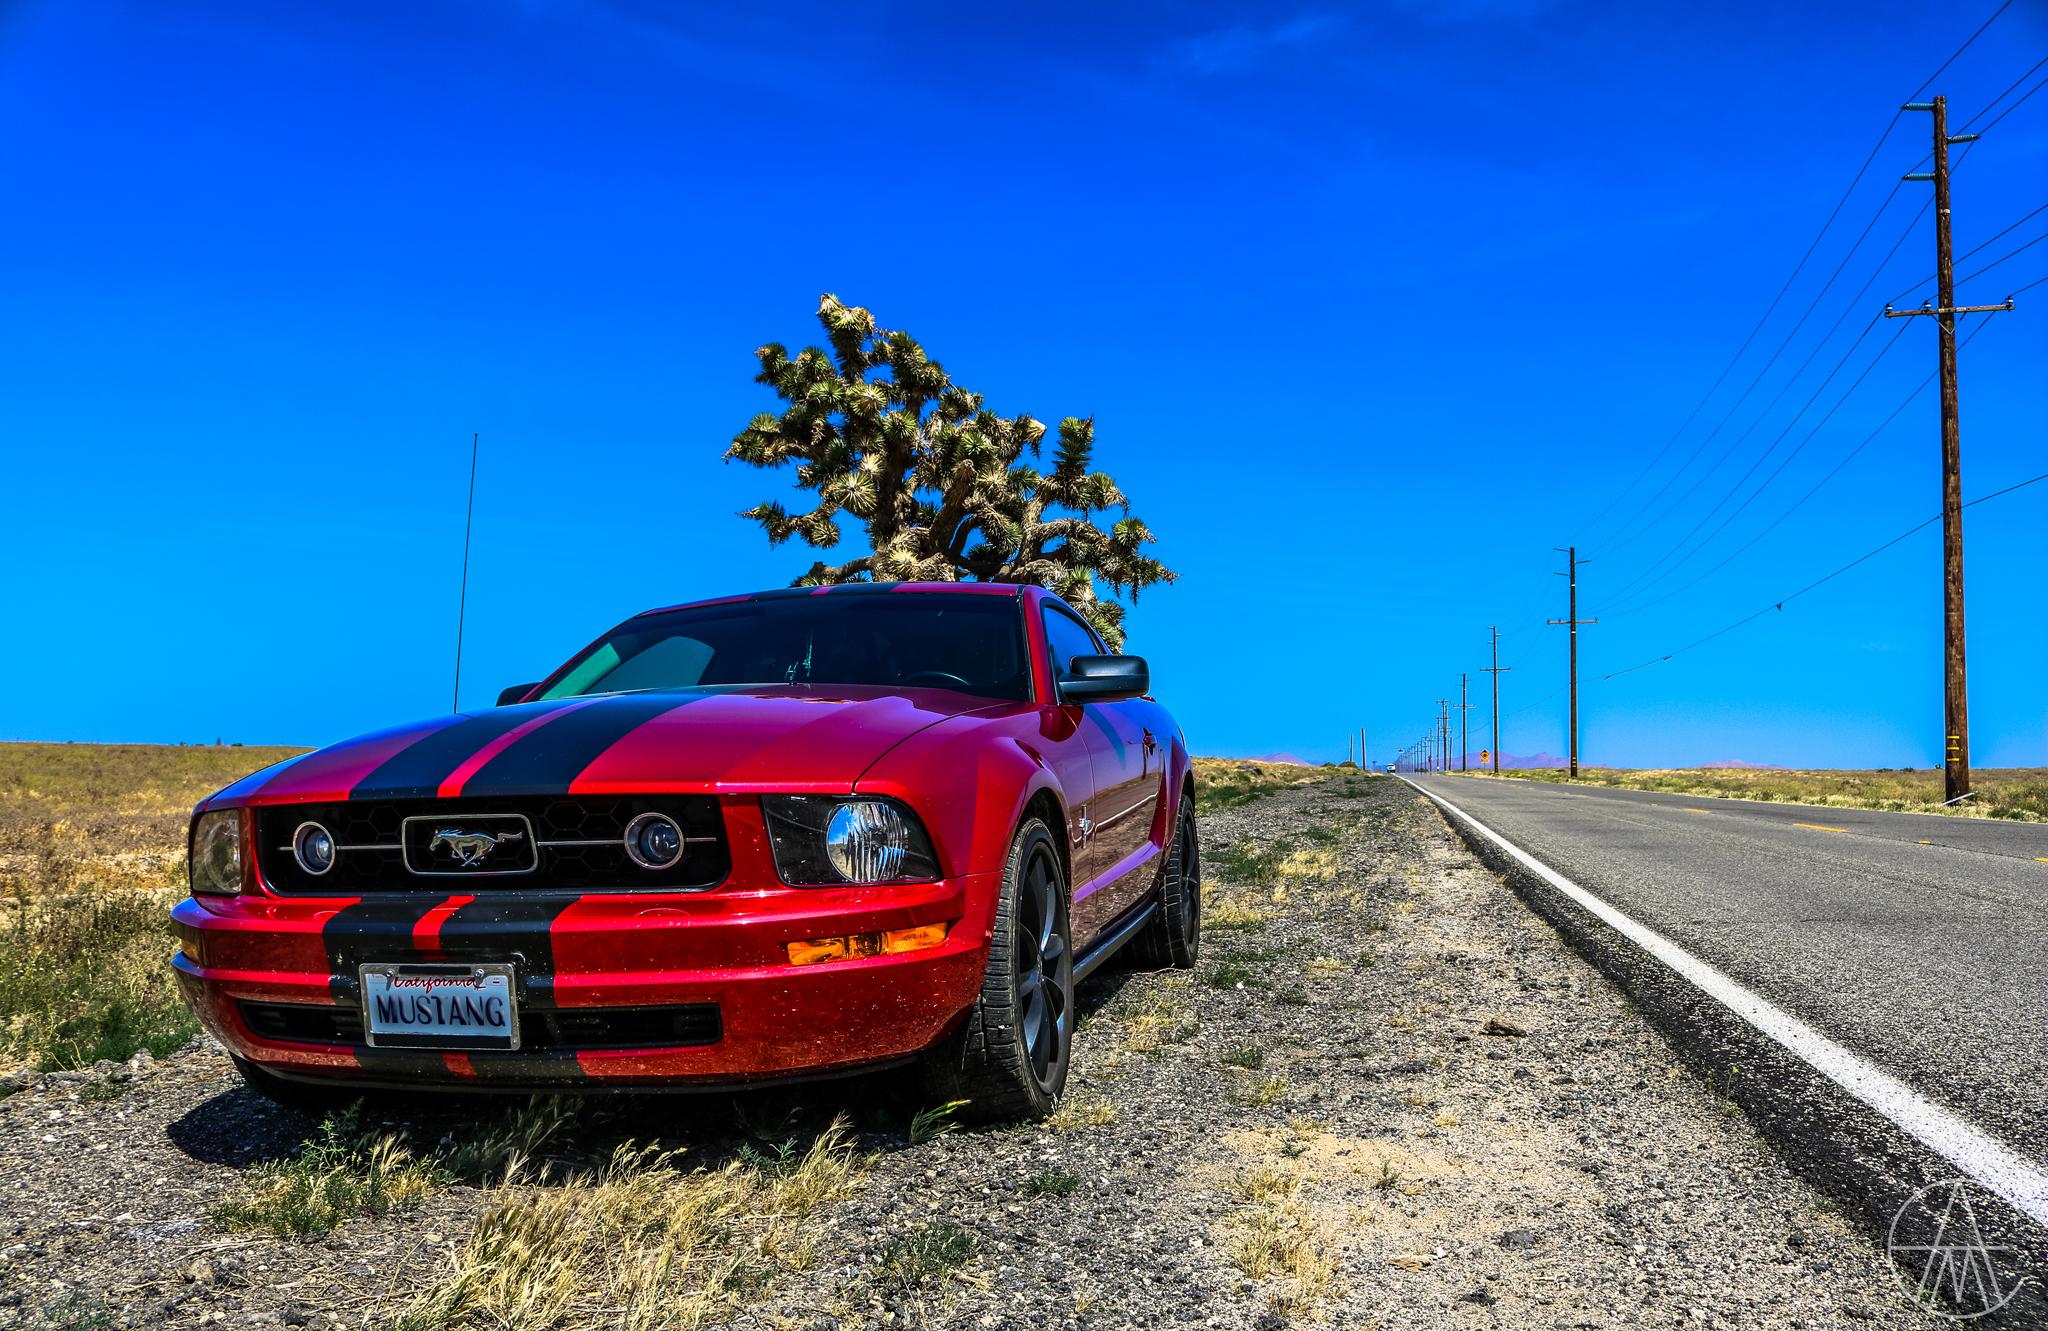 MustangDesertRoad_FACEBOOK.jpg